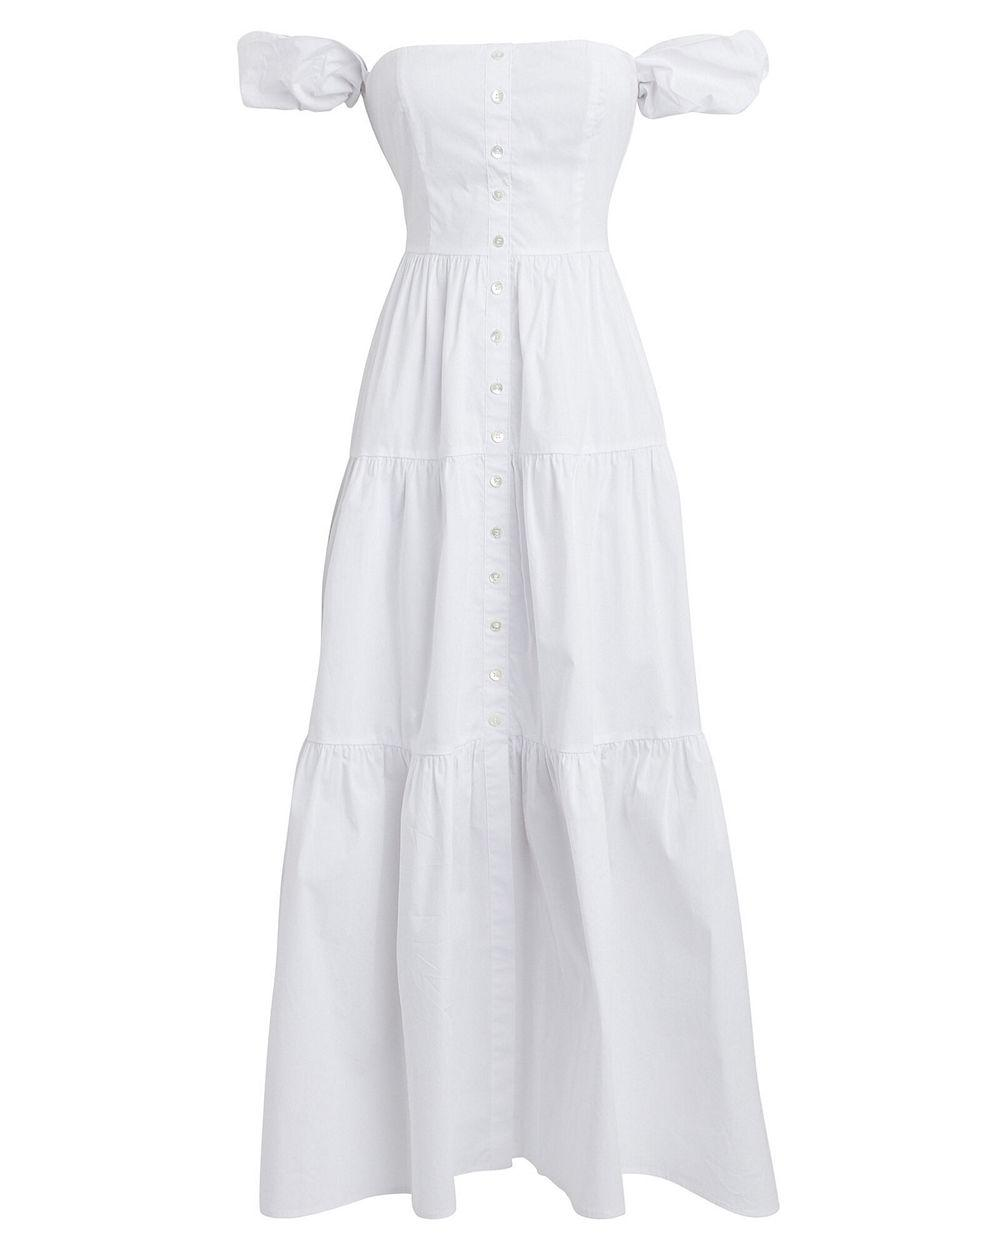 Elio Tiered Midi Dress Item # 90-7113-B